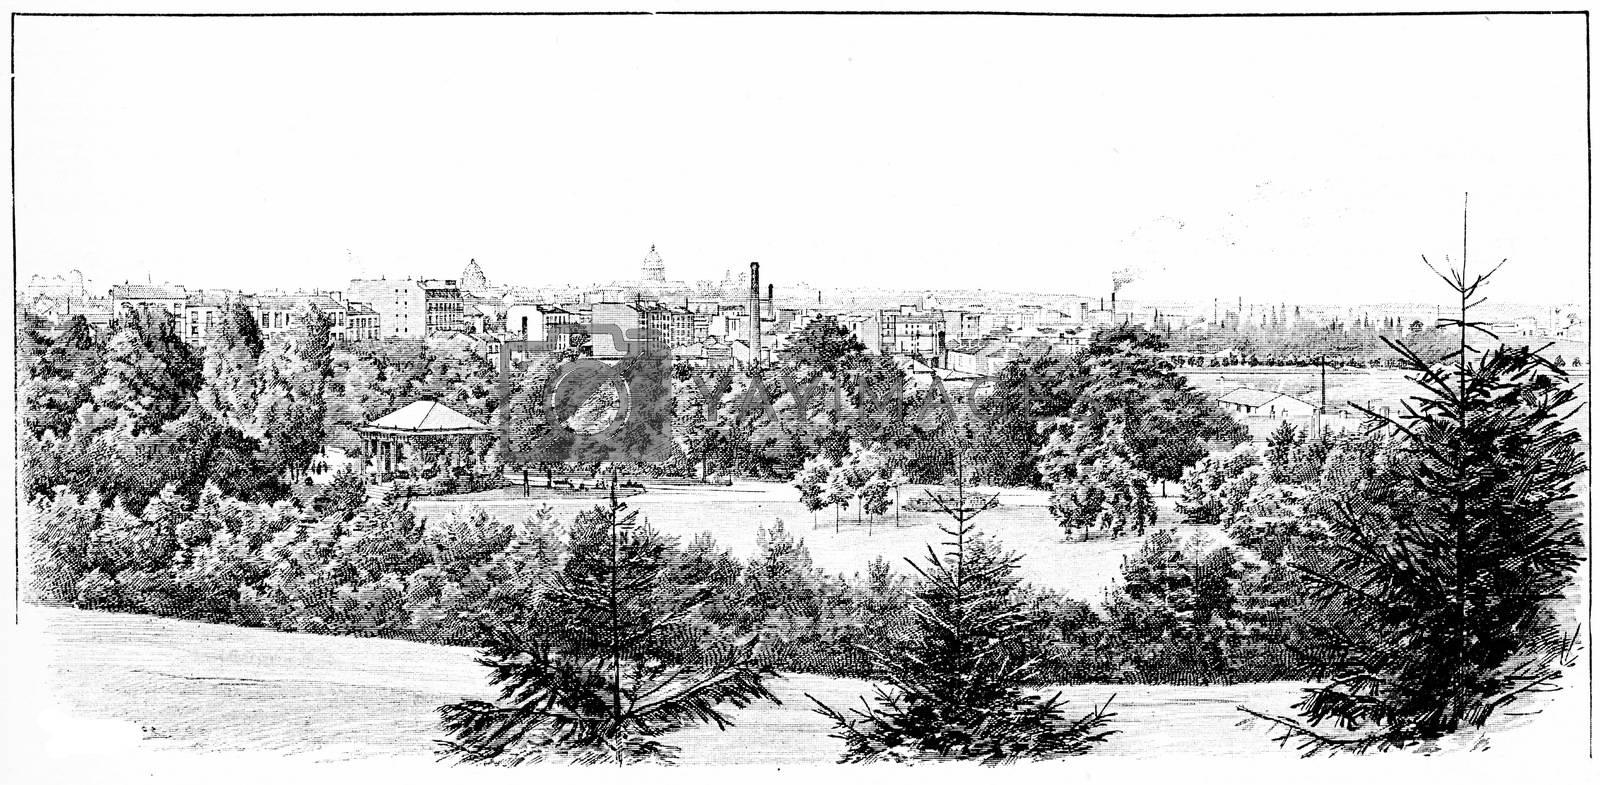 Panorama taken the Parc Montsouris, vintage engraved illustration. Paris - Auguste VITU – 1890.